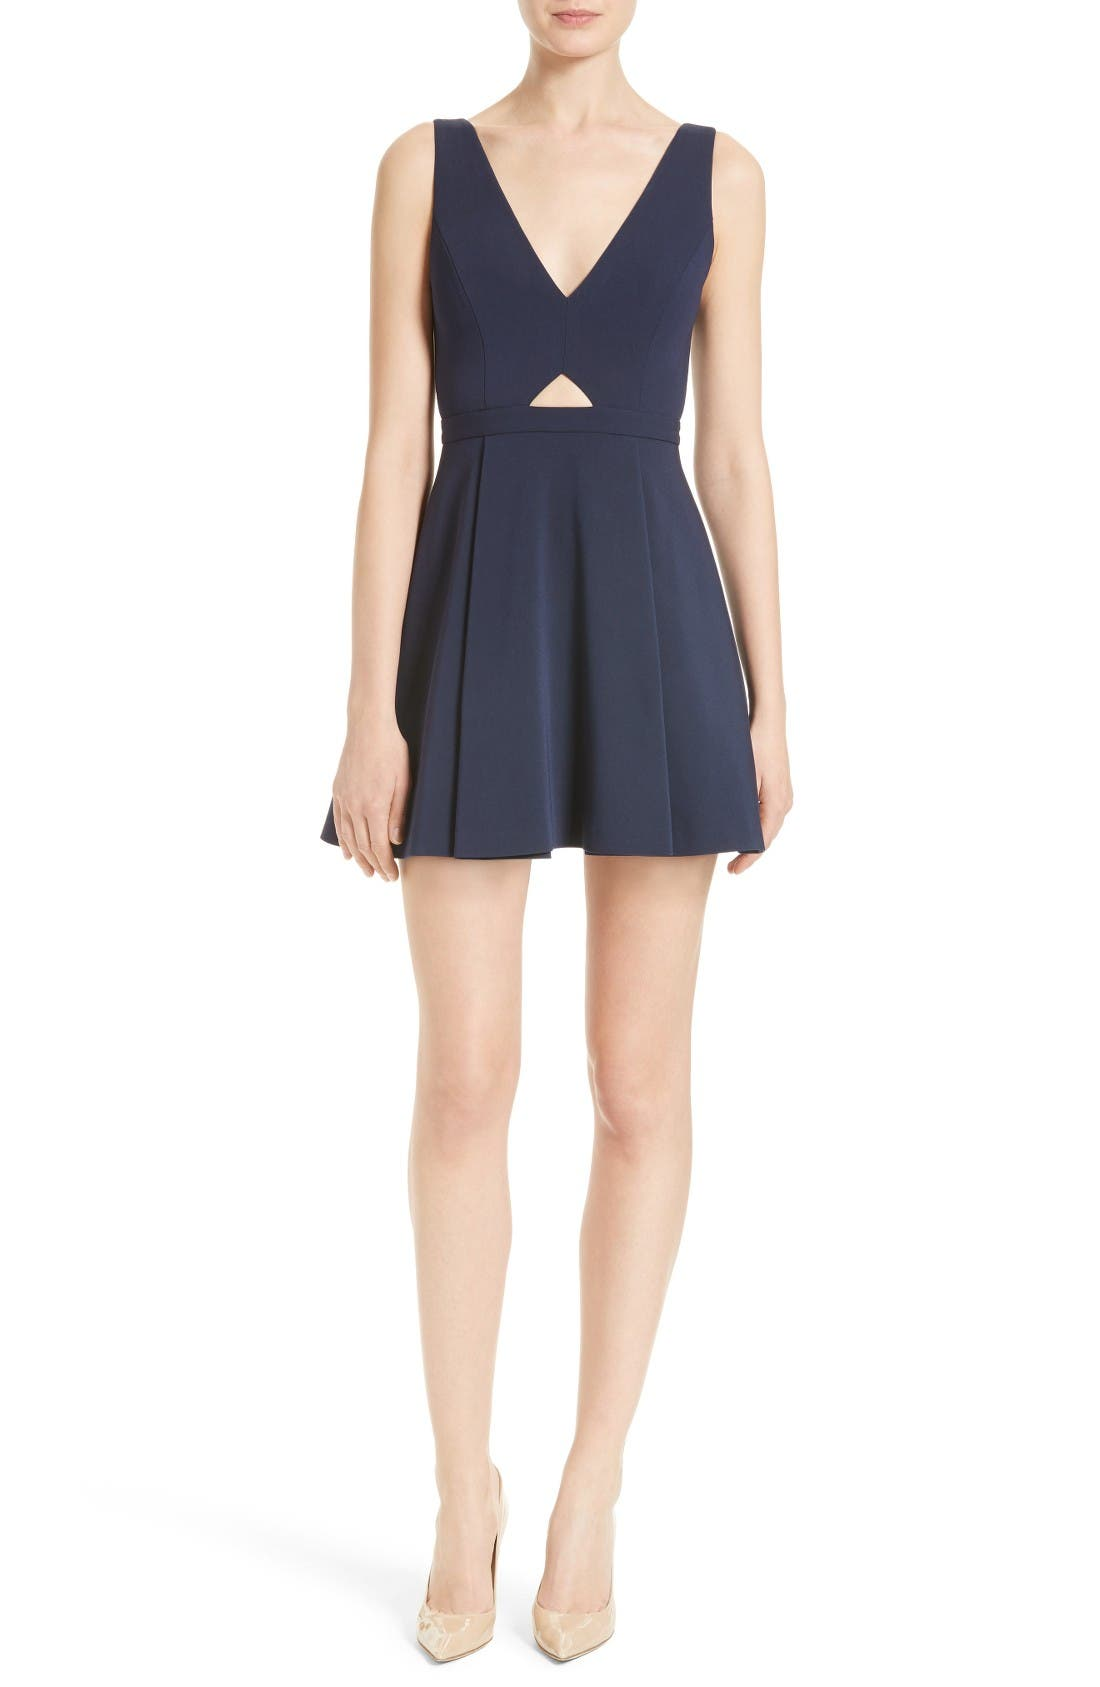 Alternate Image 1 Selected - Alice + Olivia Nina Cutout Fit & Flare Dress